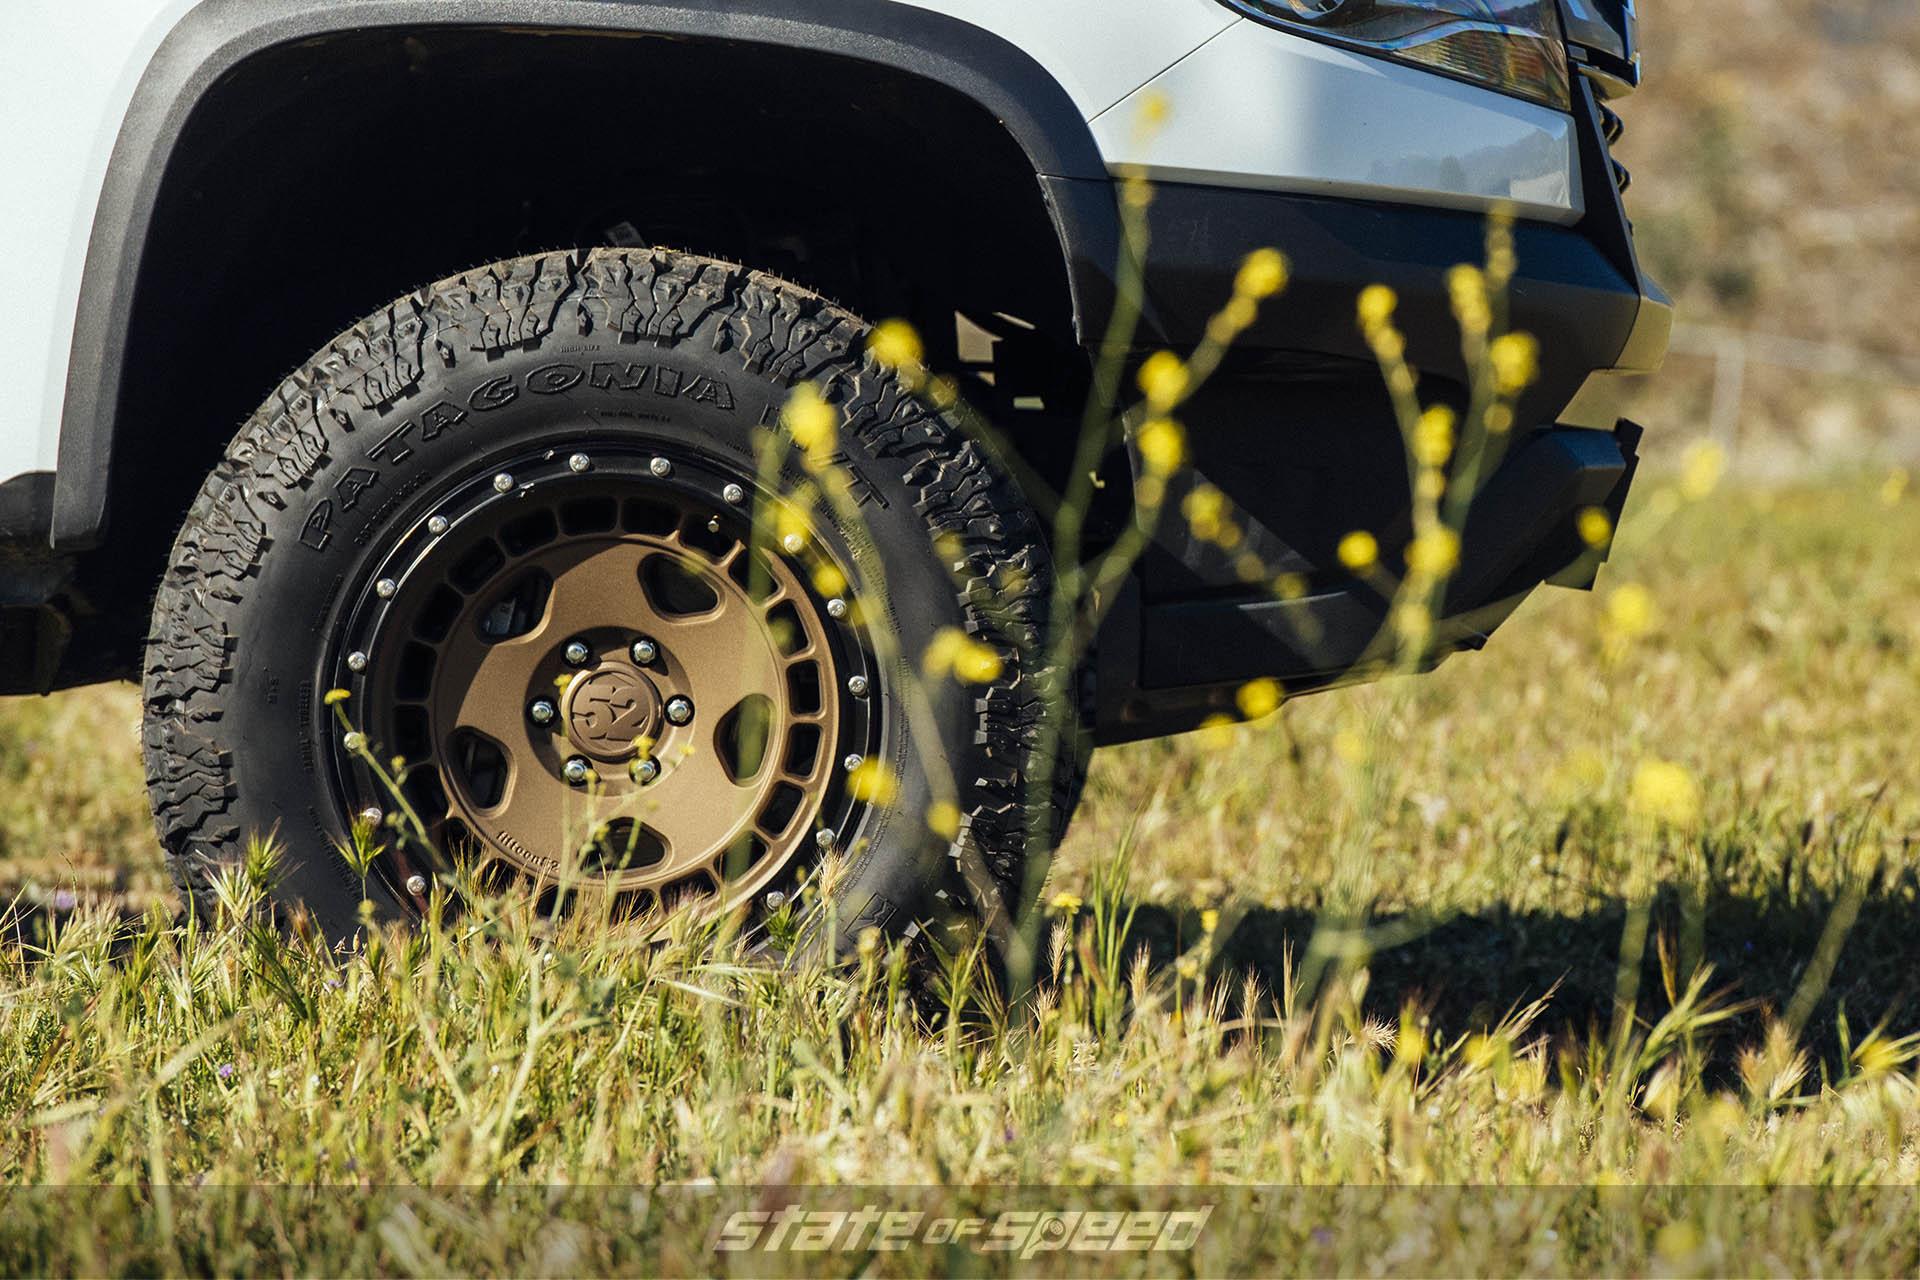 Milestar Patagonia M/Ts on Fifteen52 wheels on Toyota 4Runner